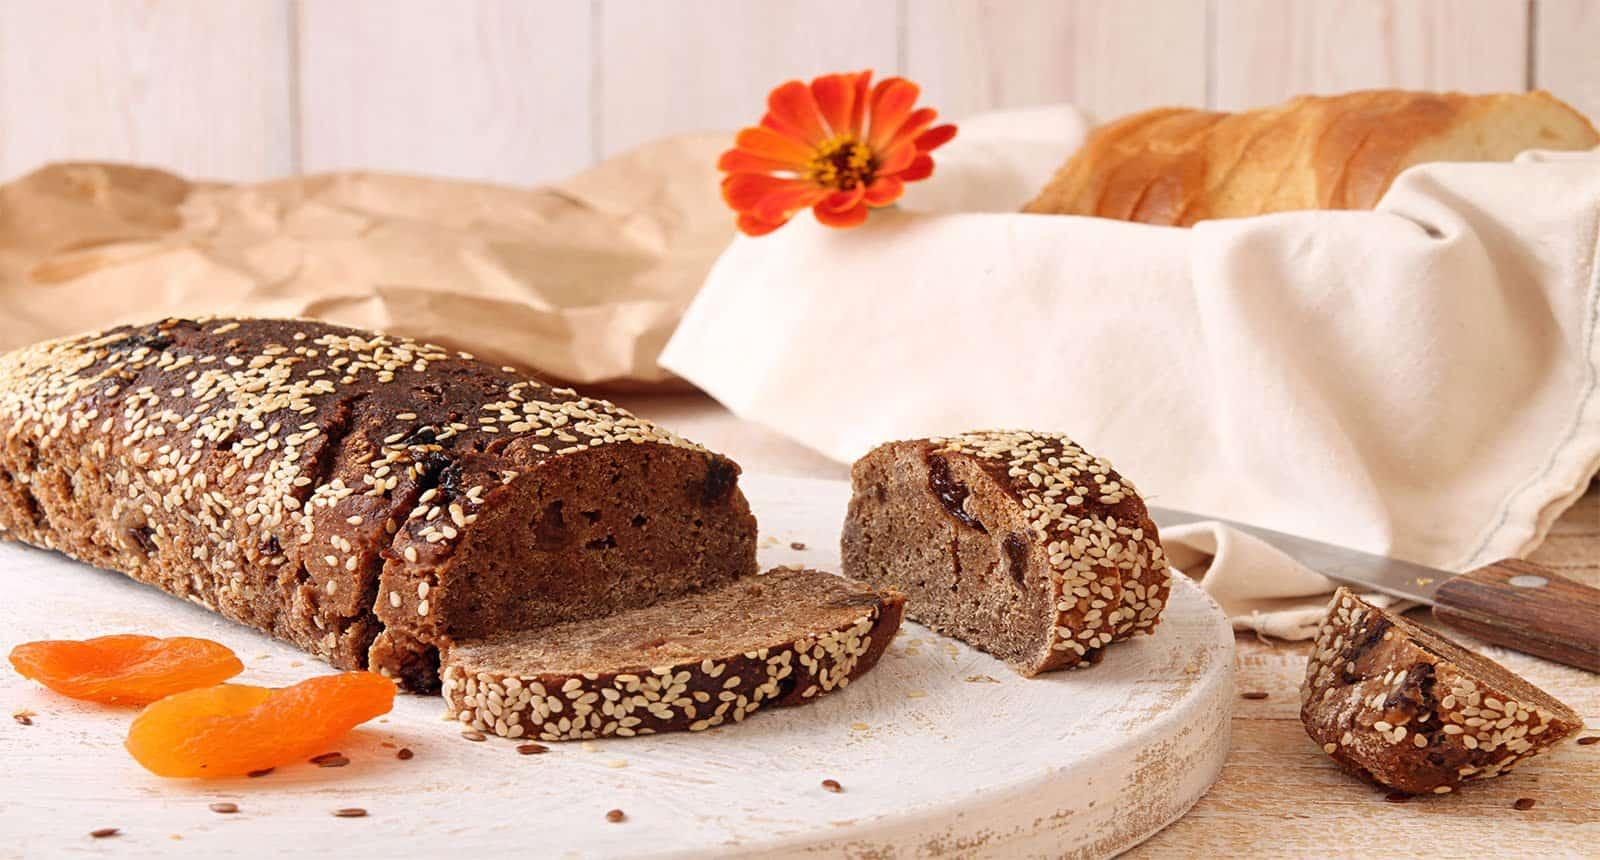 Loaf Slices Rye Unleavened